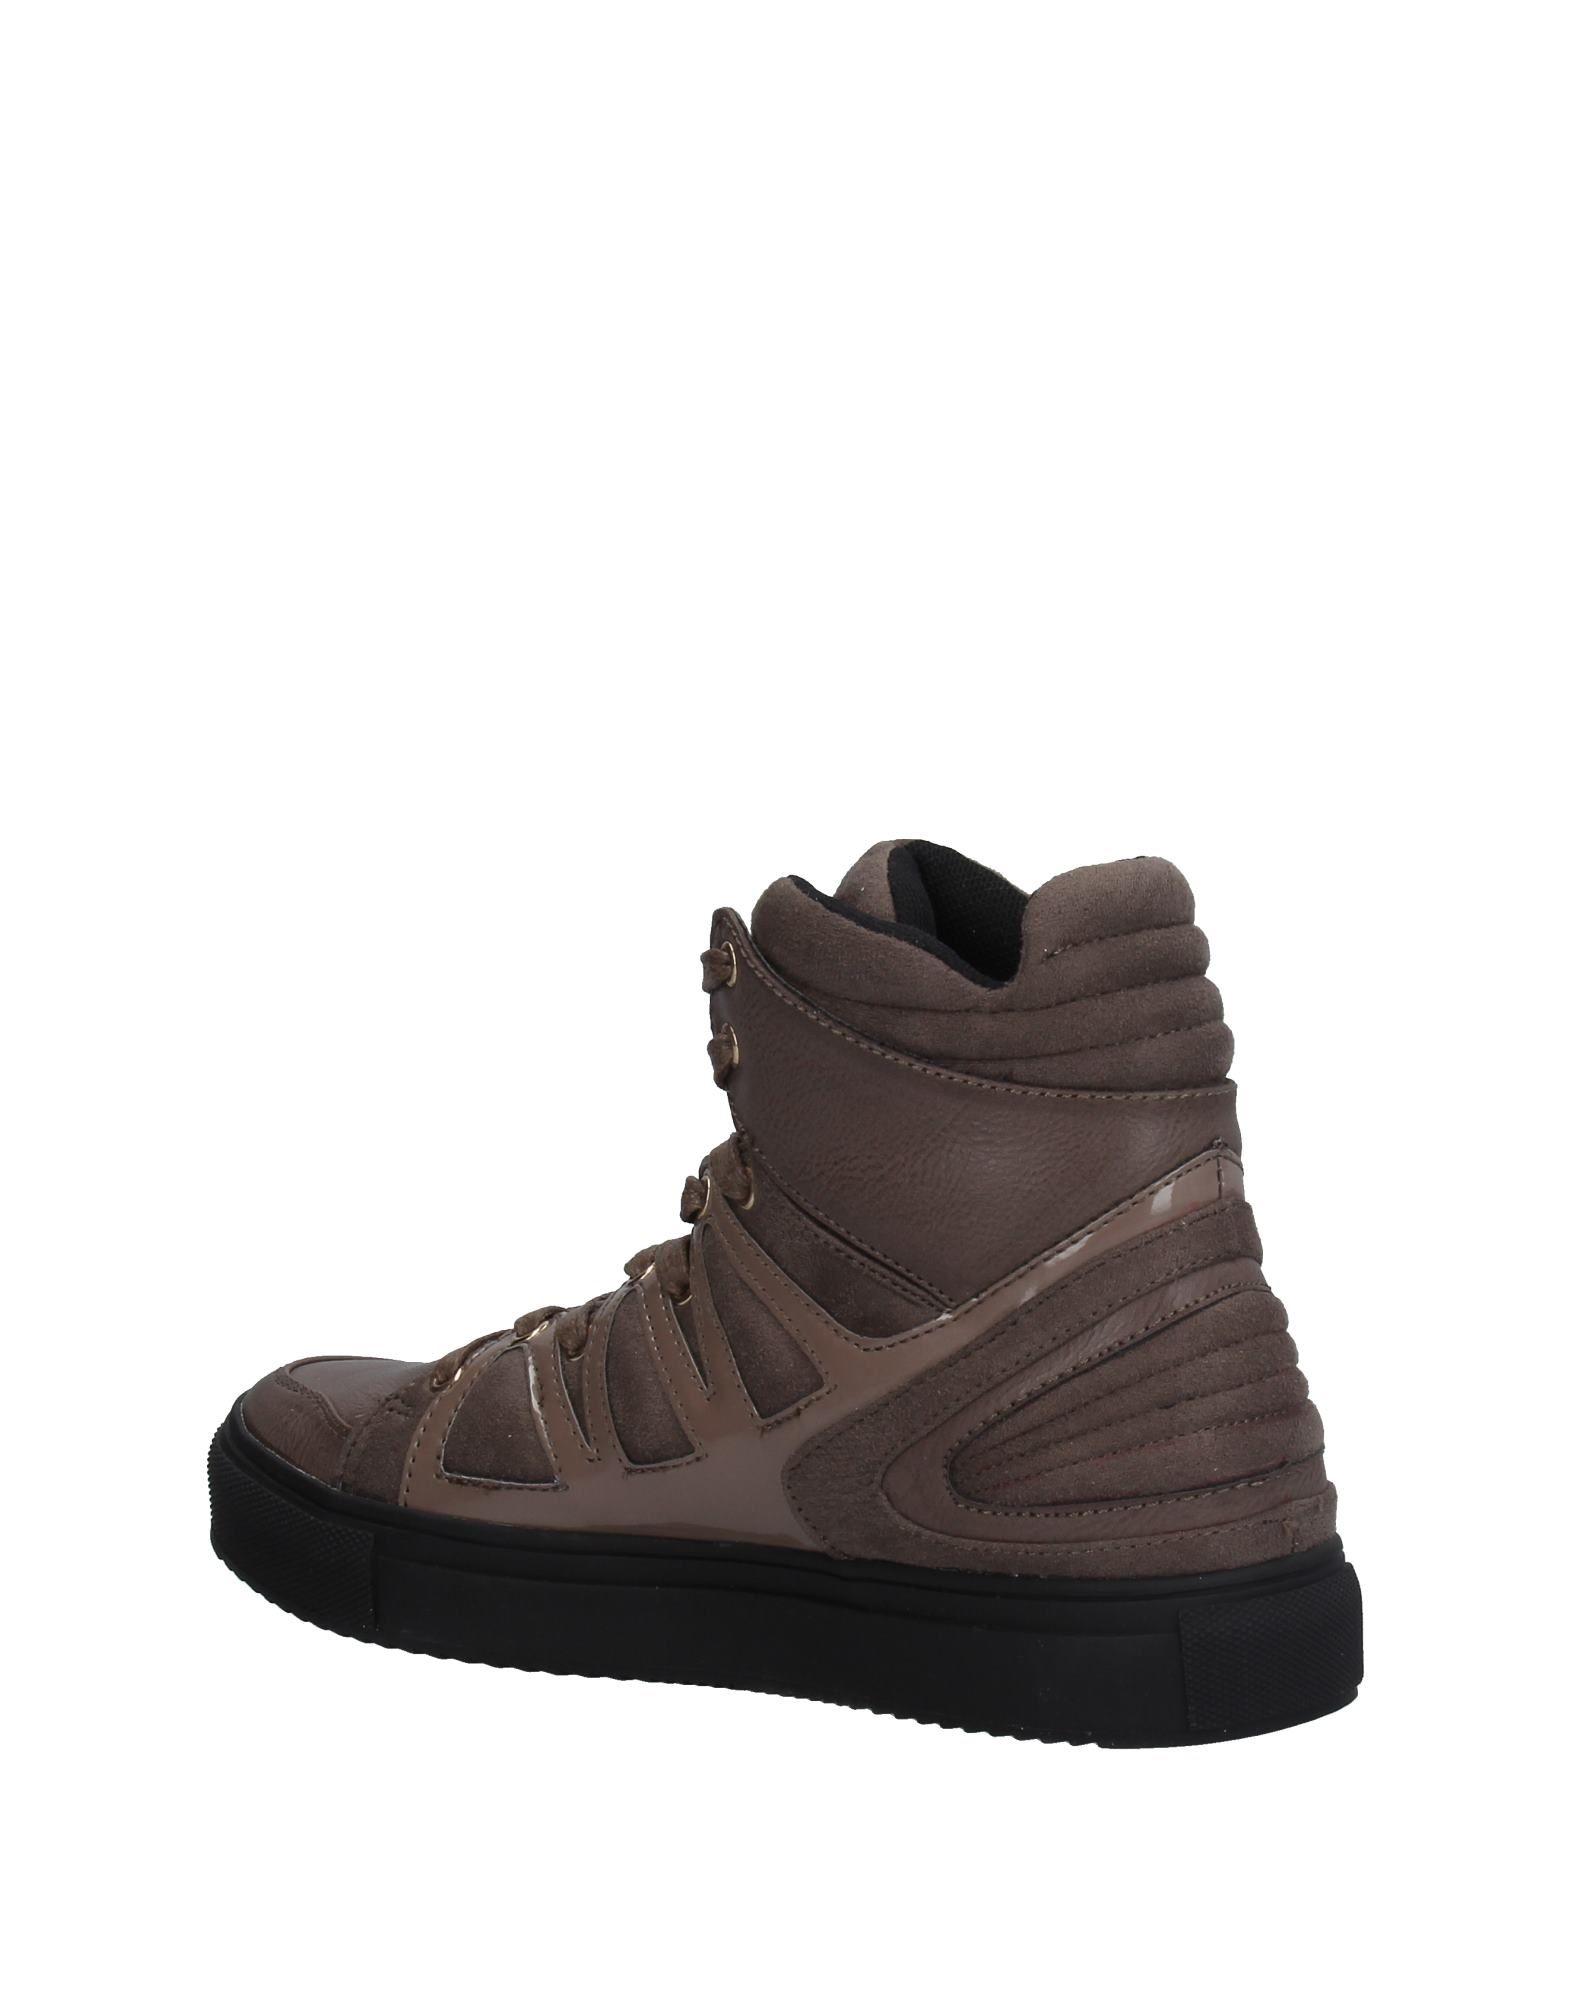 Roccobarocco Sneakers Damen Damen Sneakers  11224470CE  279865